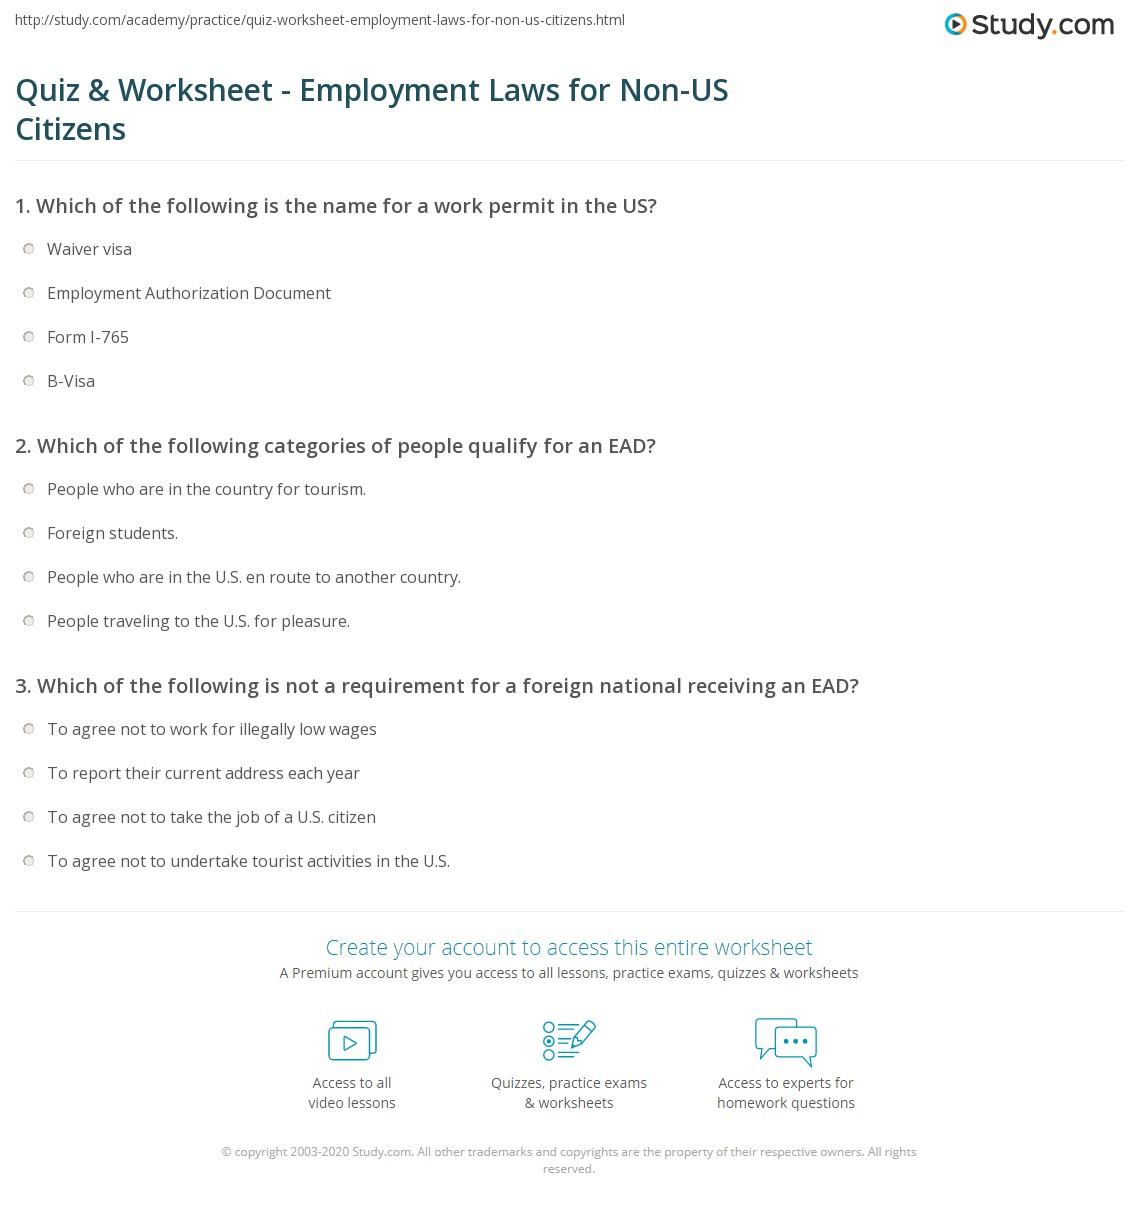 worksheet I 765 Worksheet quiz worksheet employment laws for non us citizens study com print work authorization regulations worksheet